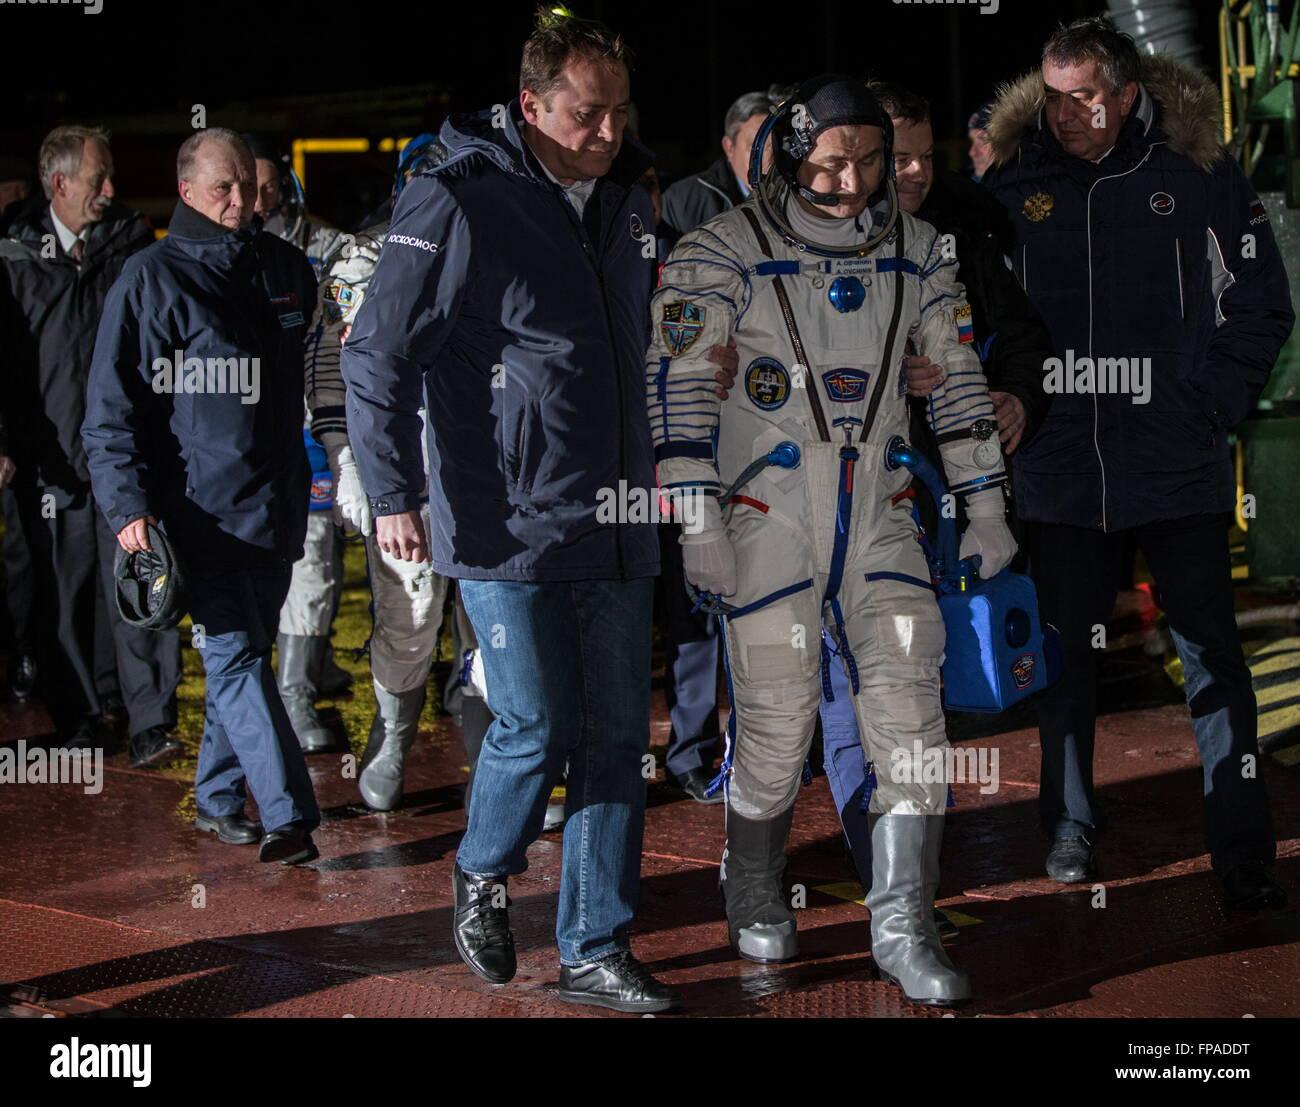 Baikonur, Kazakhstan. 18th Mar, 2016. Crew member of Expedition 47/48, Roscosmos cosmonaut Alexei Ovchinin in a - Stock Image